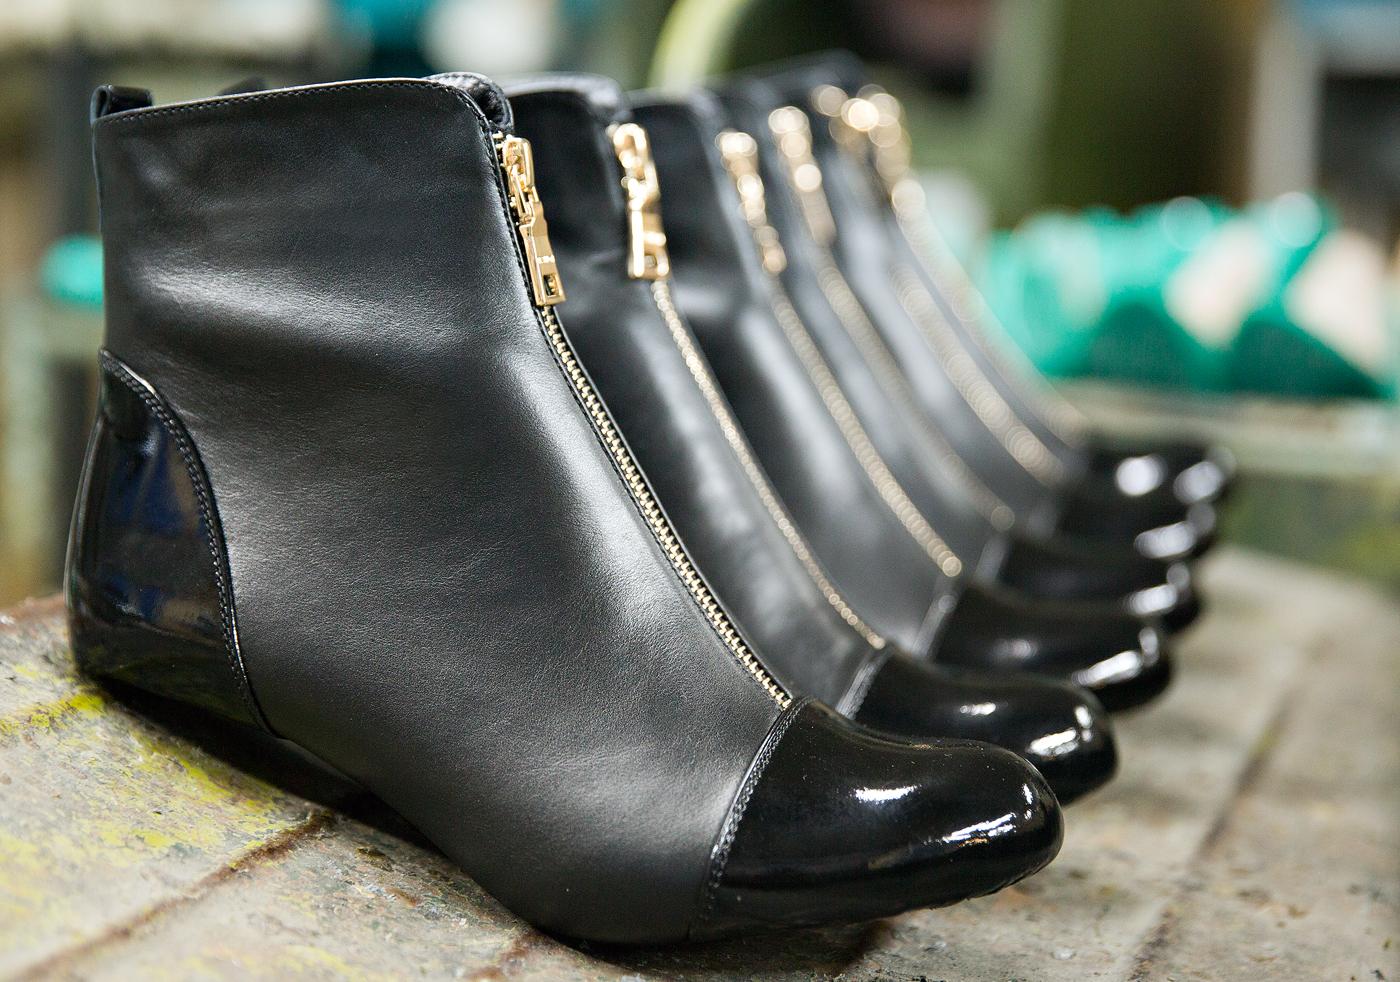 f6f500230 Днепропетровская обувная фабрика POLI - Производство и продажа ...